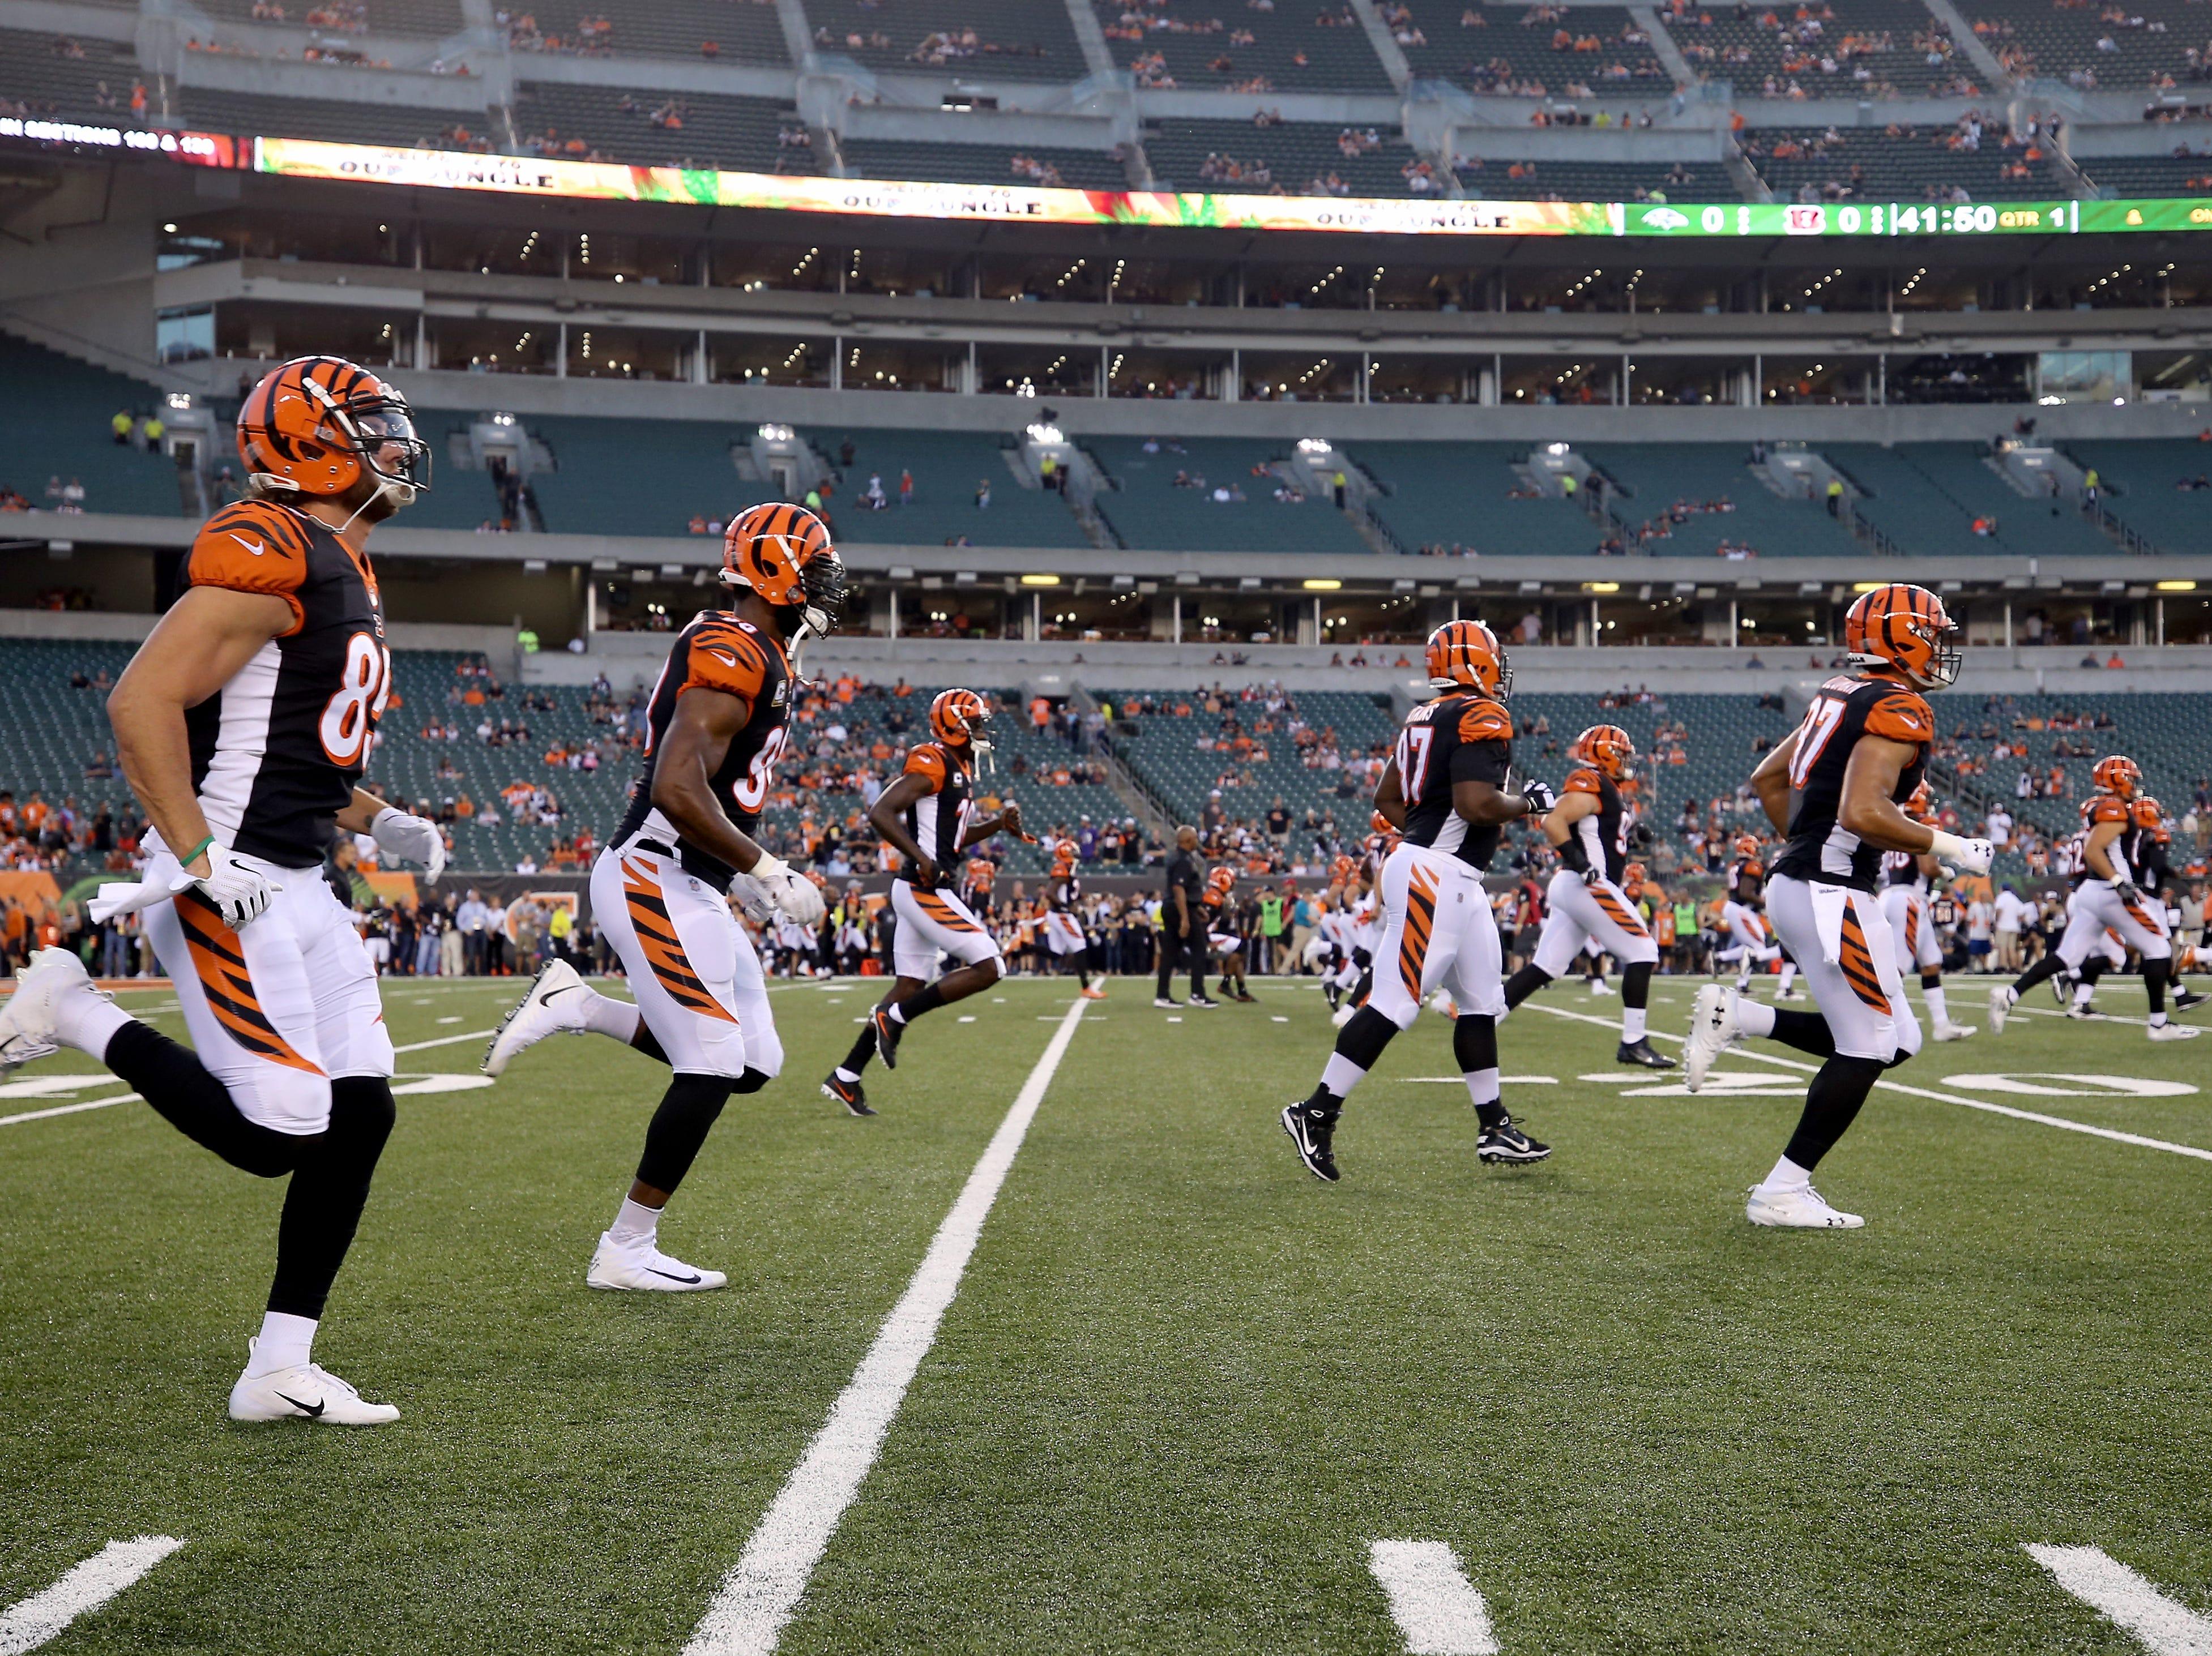 The Cincinnati Bengals warm up before the Week 2 NFL football game between the Baltimore Ravens and the Cincinnati Bengals, Thursday, Sept. 13, 2018, Paul Brown Stadium in Cincinnati.